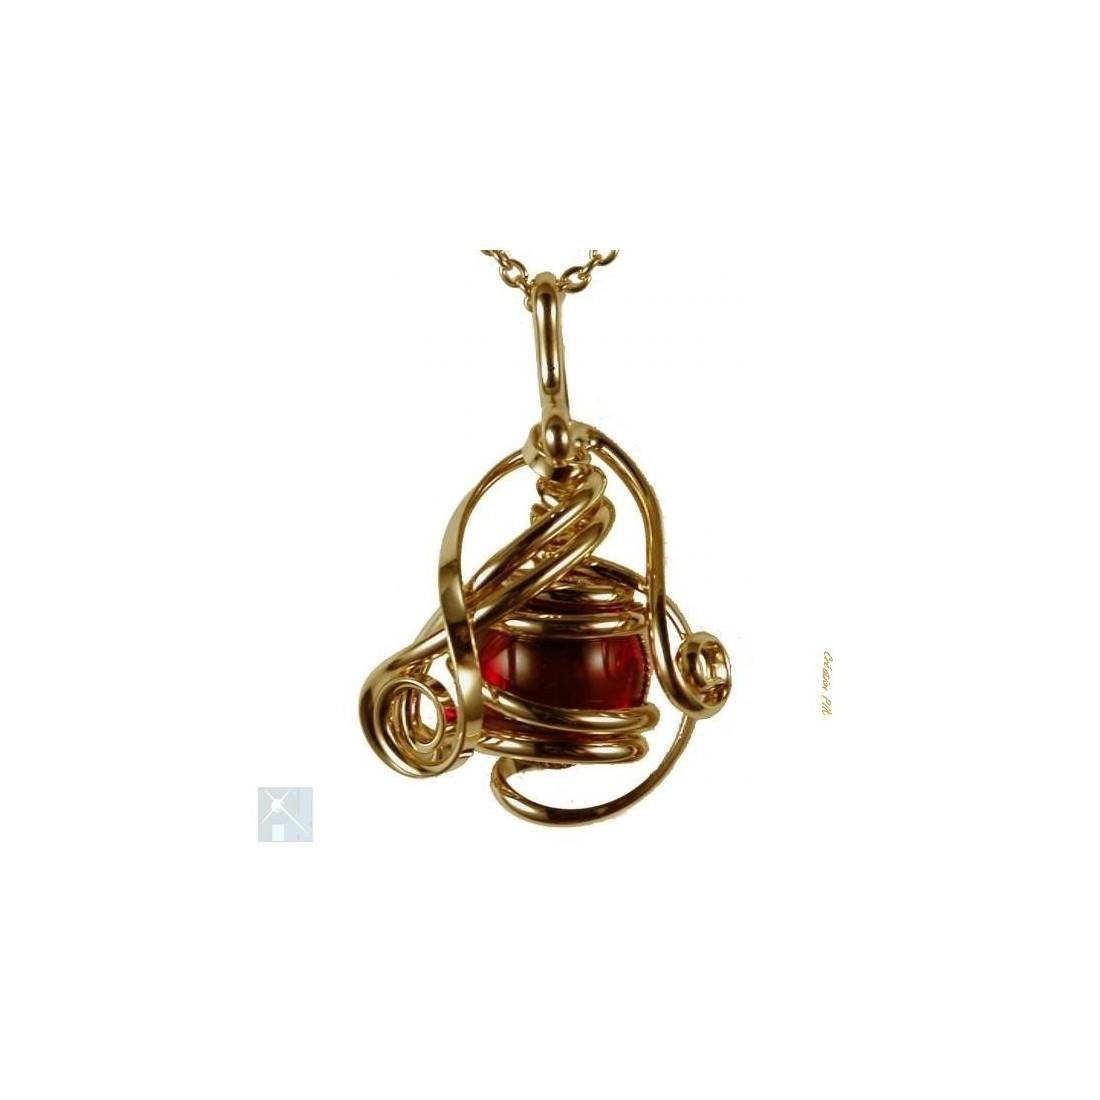 Très joli petit pendentif avec un cabochon rouge rubis. Bijou artisanal made in France.